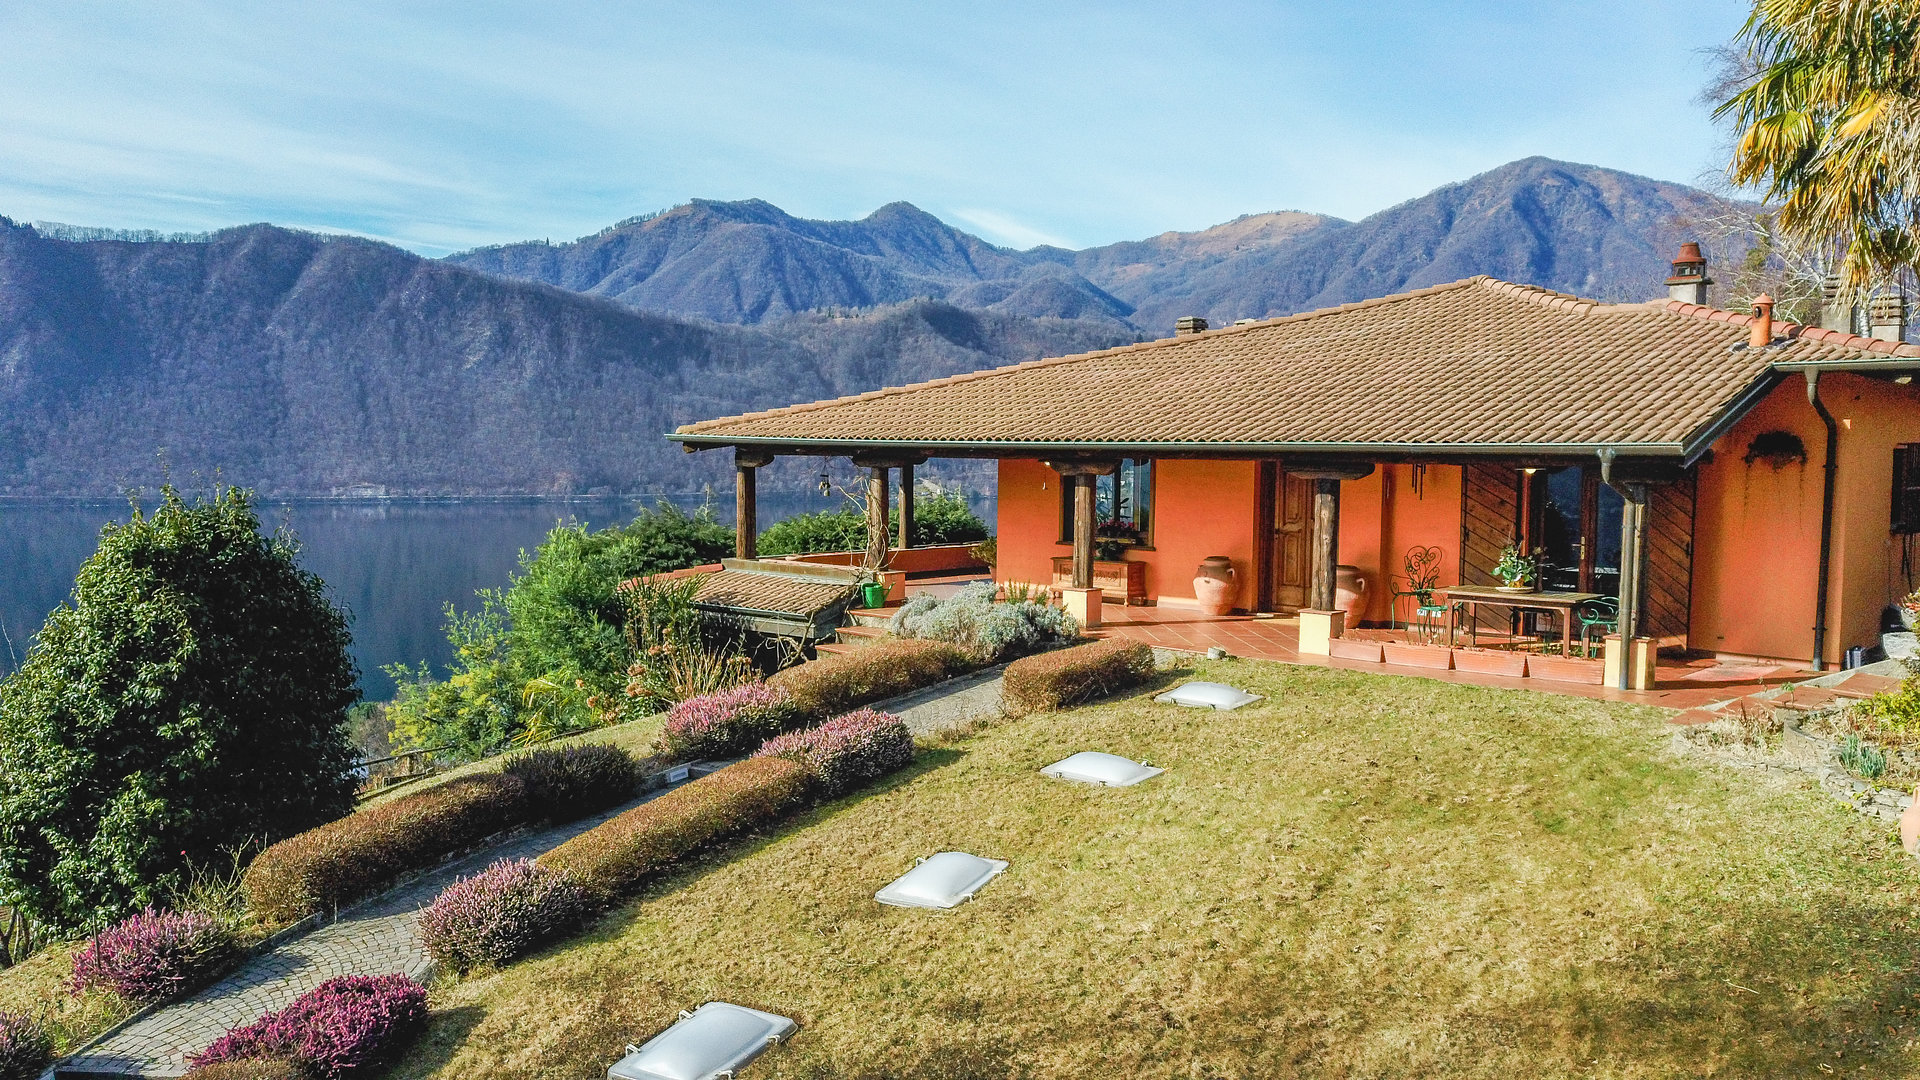 Elegant villa for sale in Pettenasco, overlooking the Lake Orta